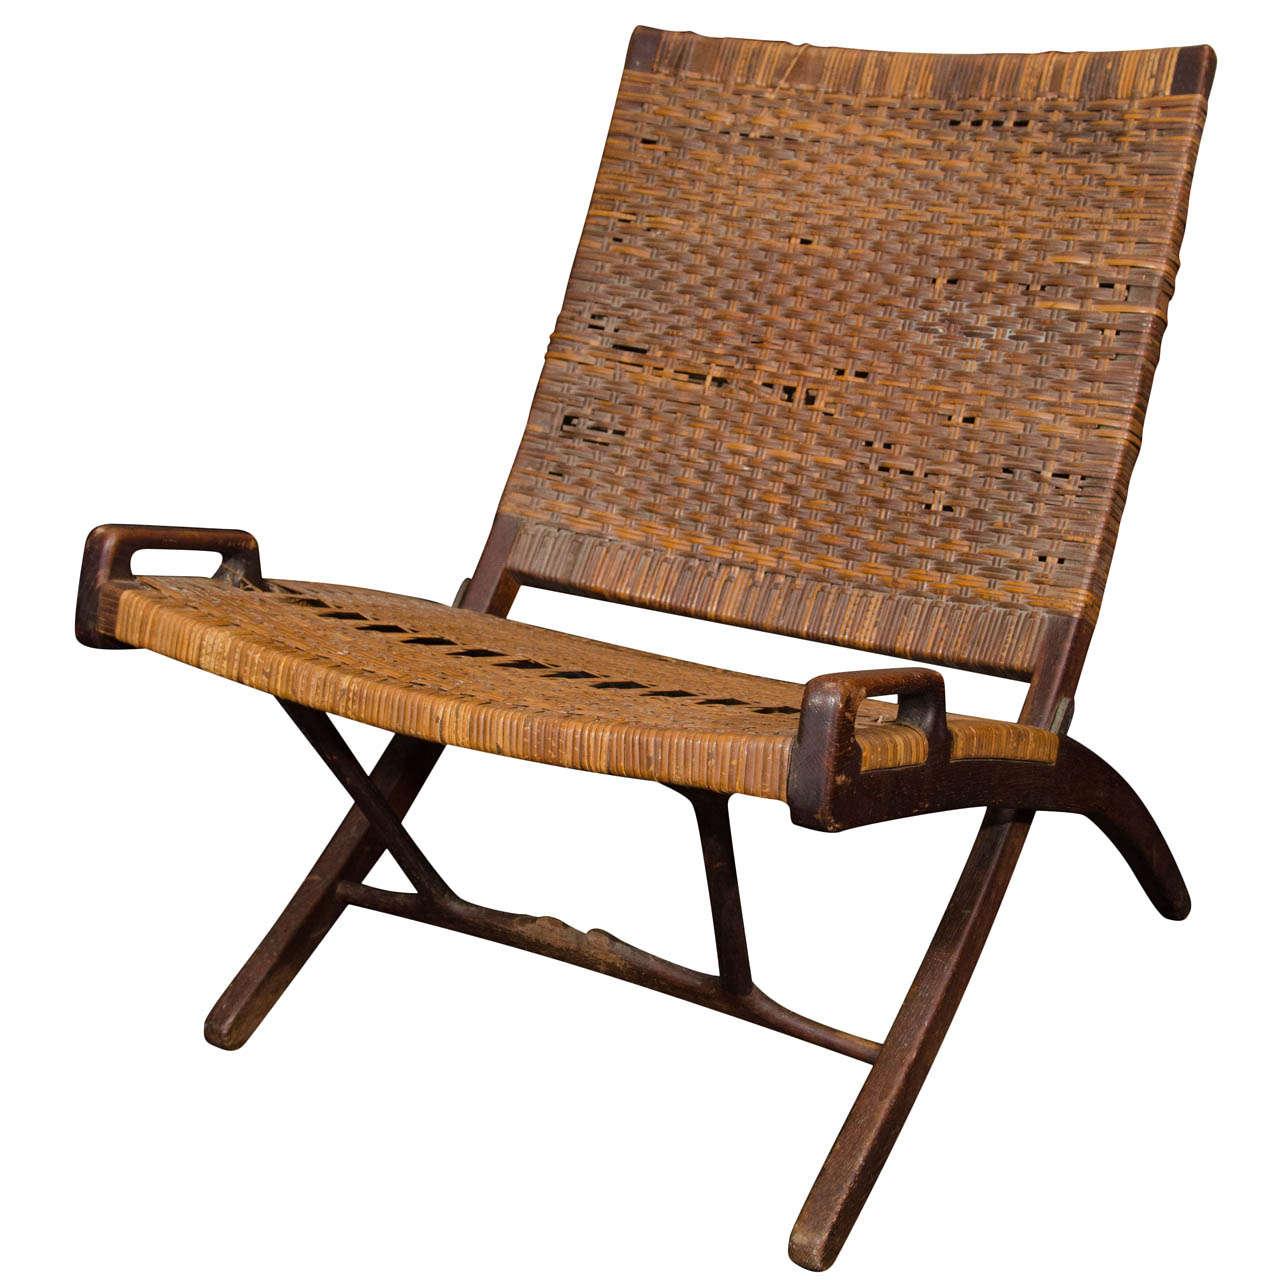 Hans Wegner Oak Cane Folding Chair Stamped Johannes Hansen at 1stdibs